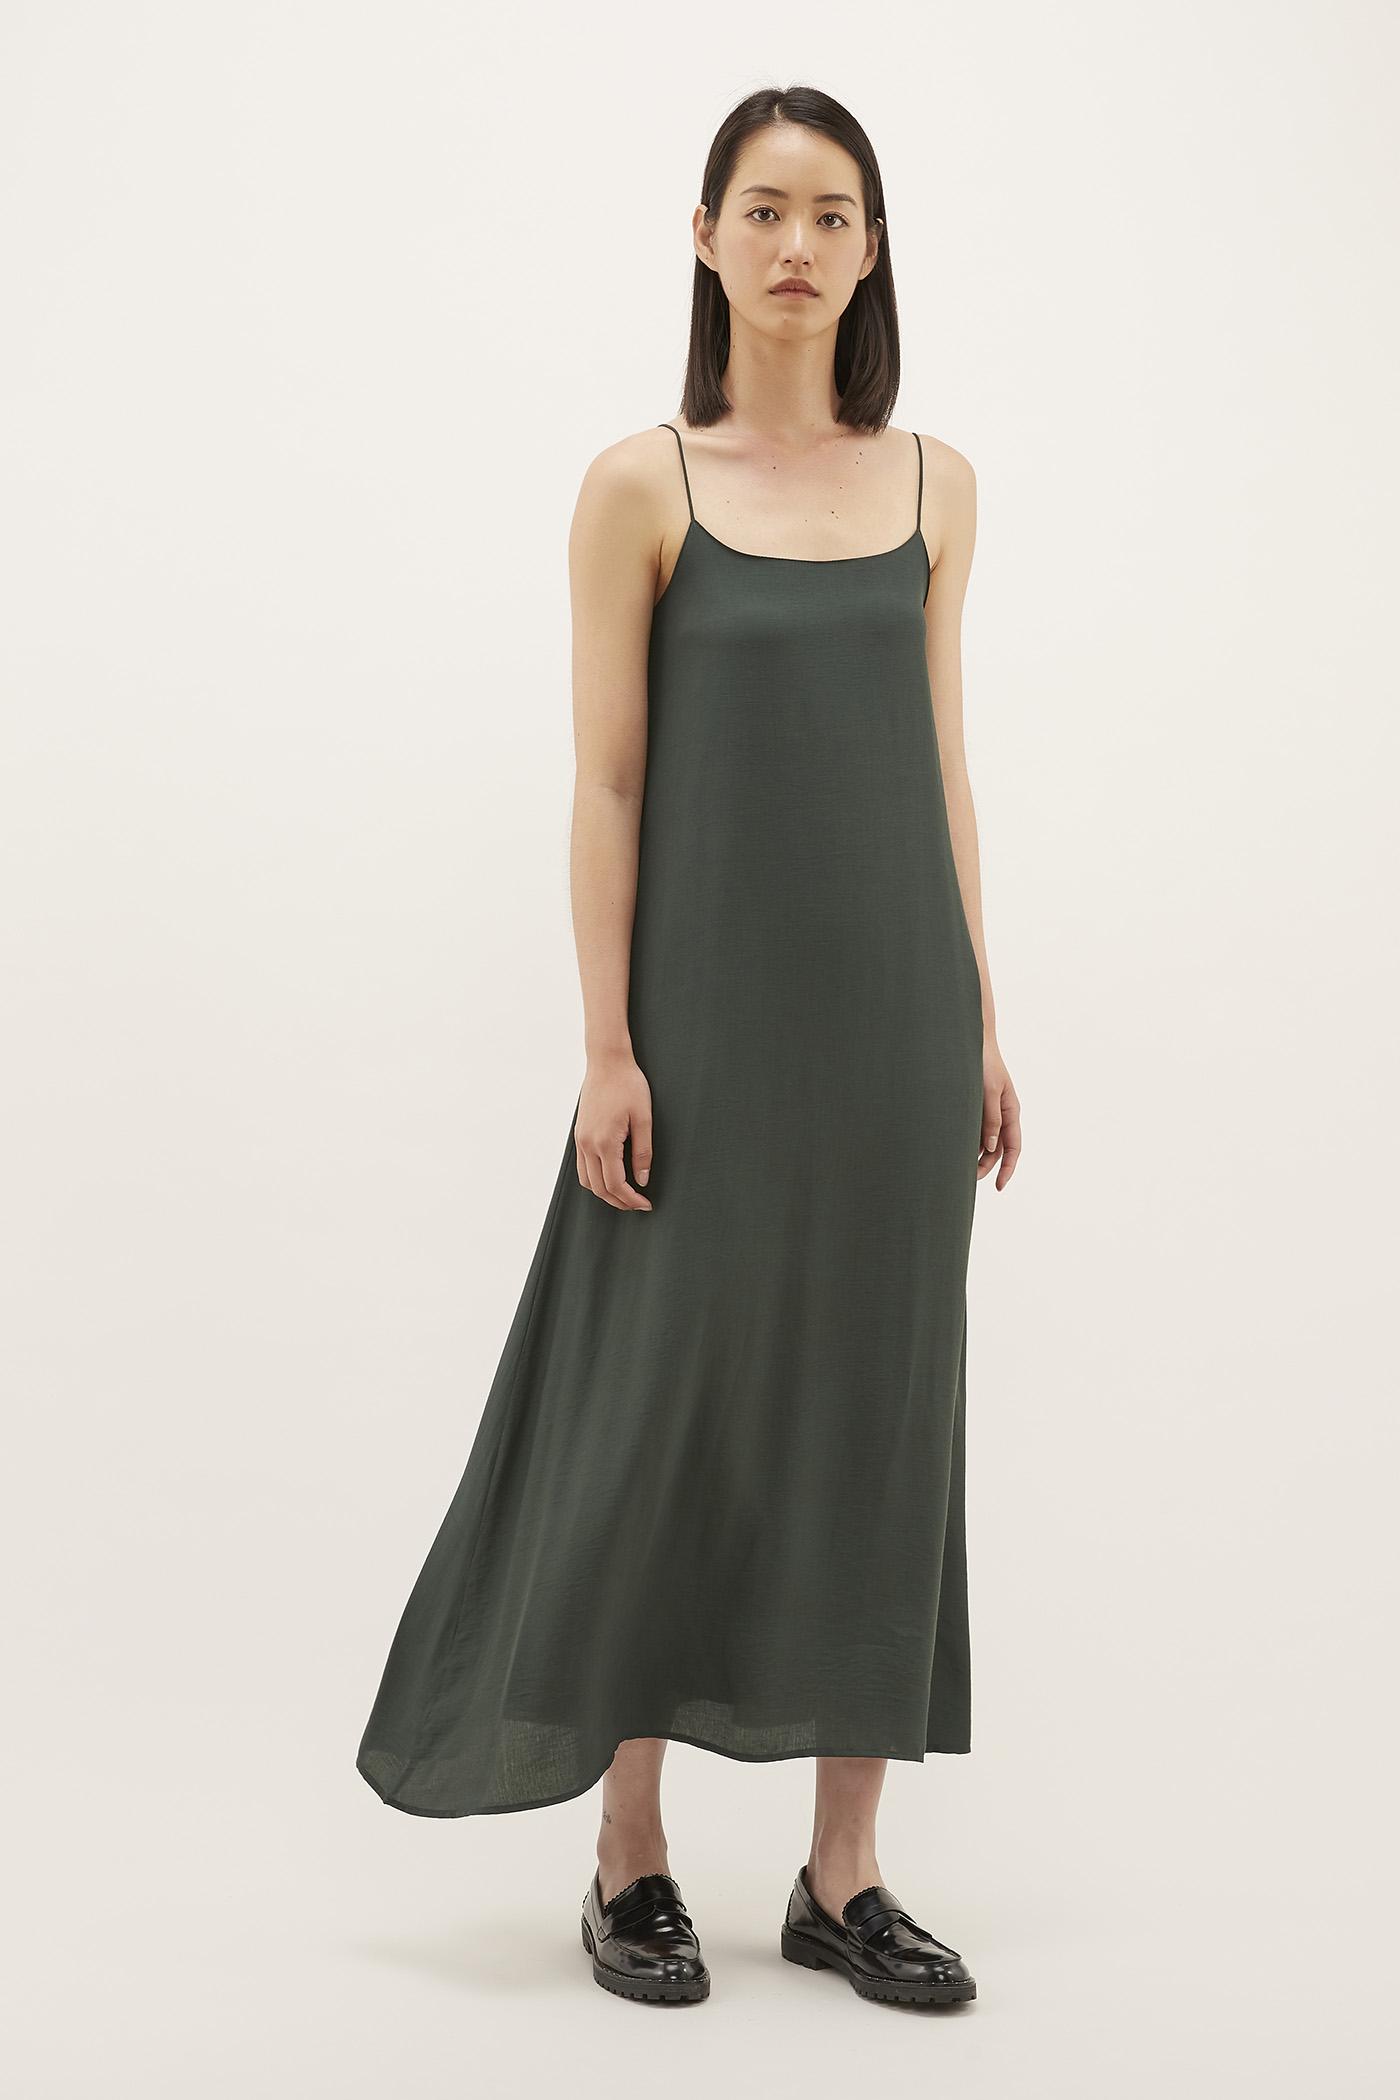 Caelia Maxi Dress